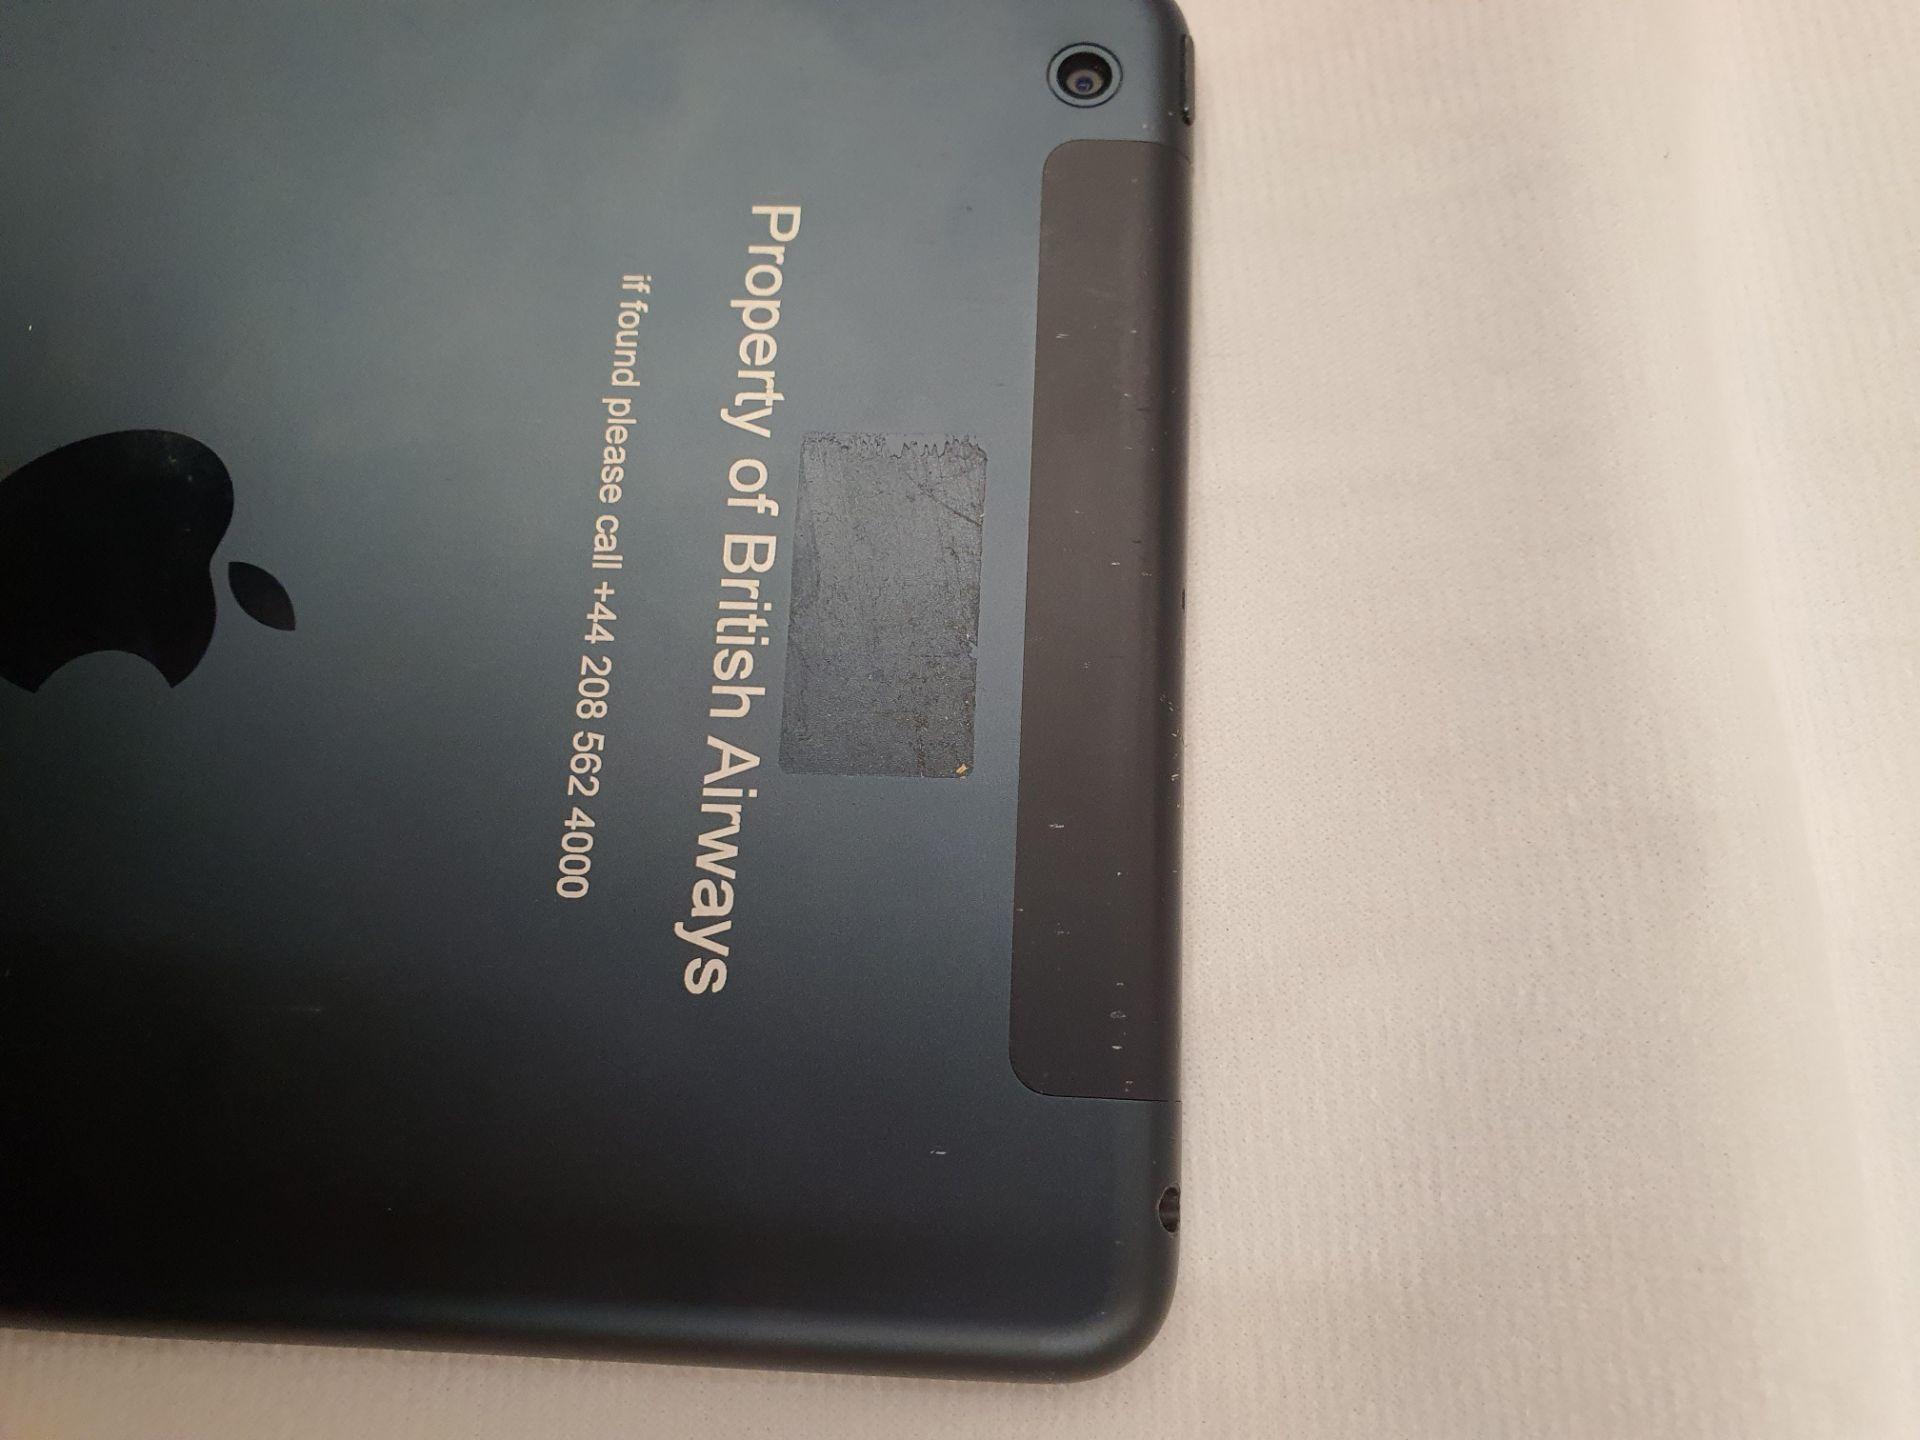 Lot 60054 - V Grade B Apple iPad Mini A1455 - Ex Lease (Has British Airways Engraving/Etching) - 16GB - Unit